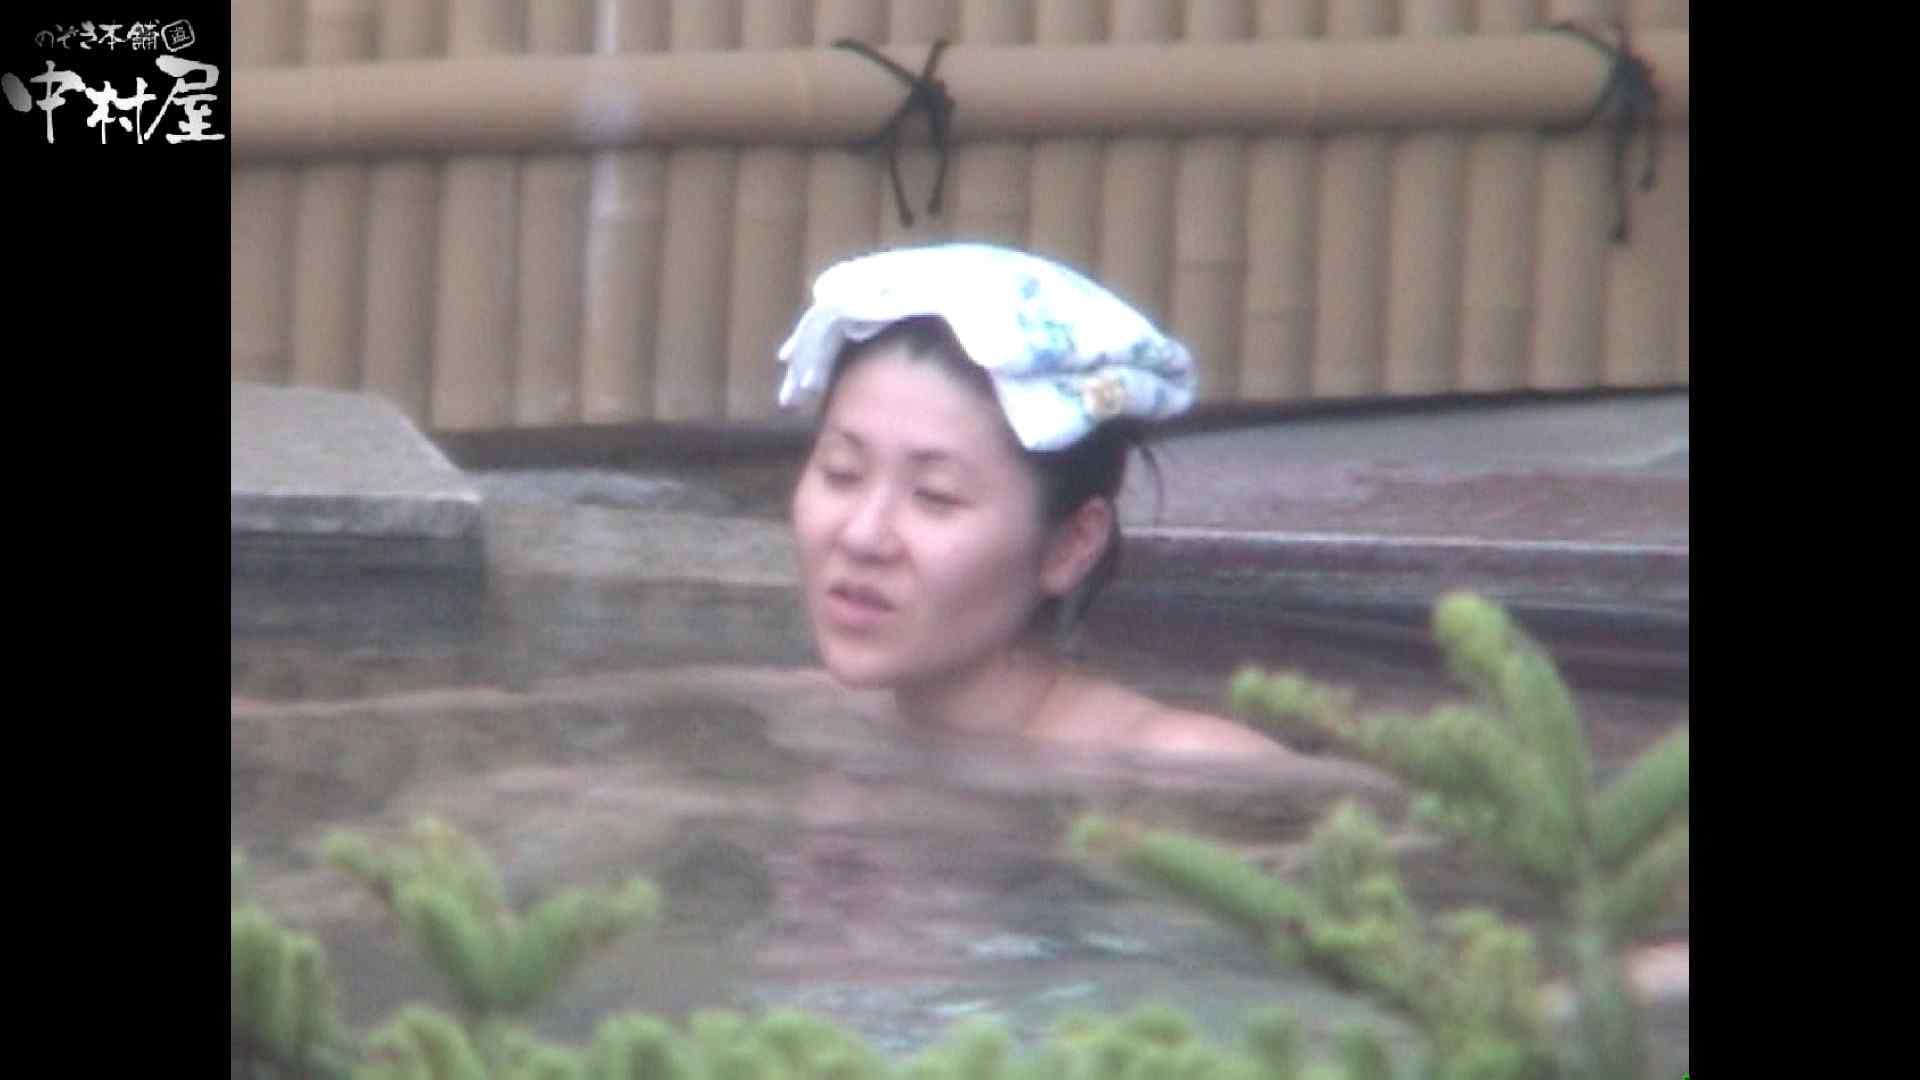 Aquaな露天風呂Vol.925 盗撮シリーズ | 露天風呂編  77PIX 73